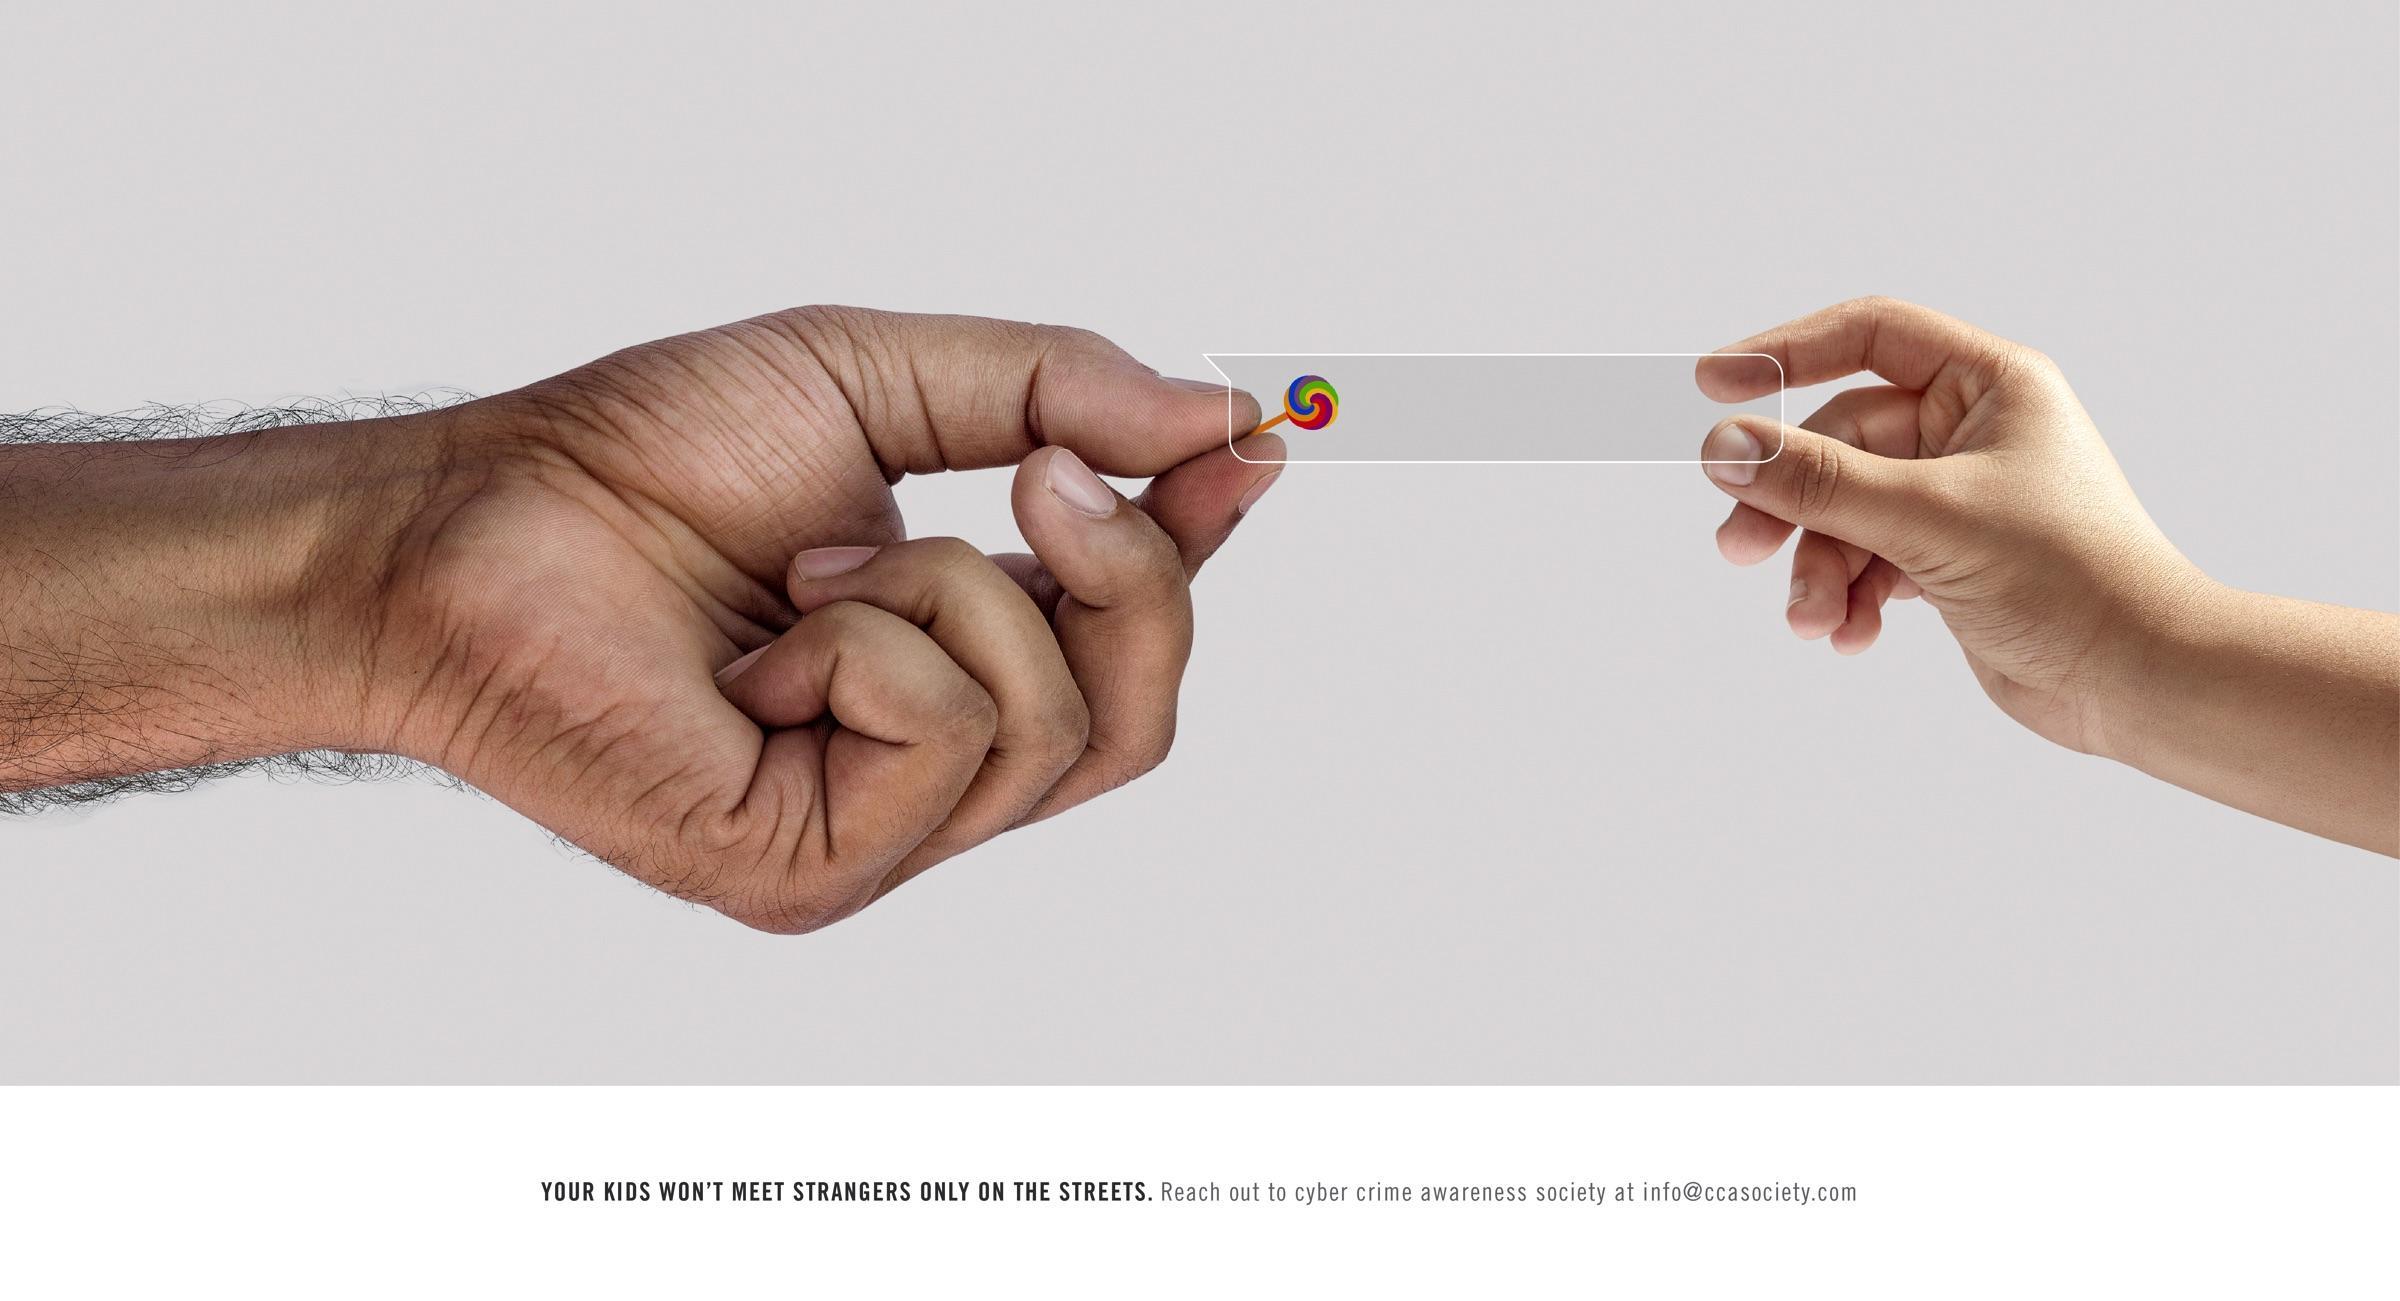 Cyber Crime Awareness Society Print Ad - Online Predators, Candy